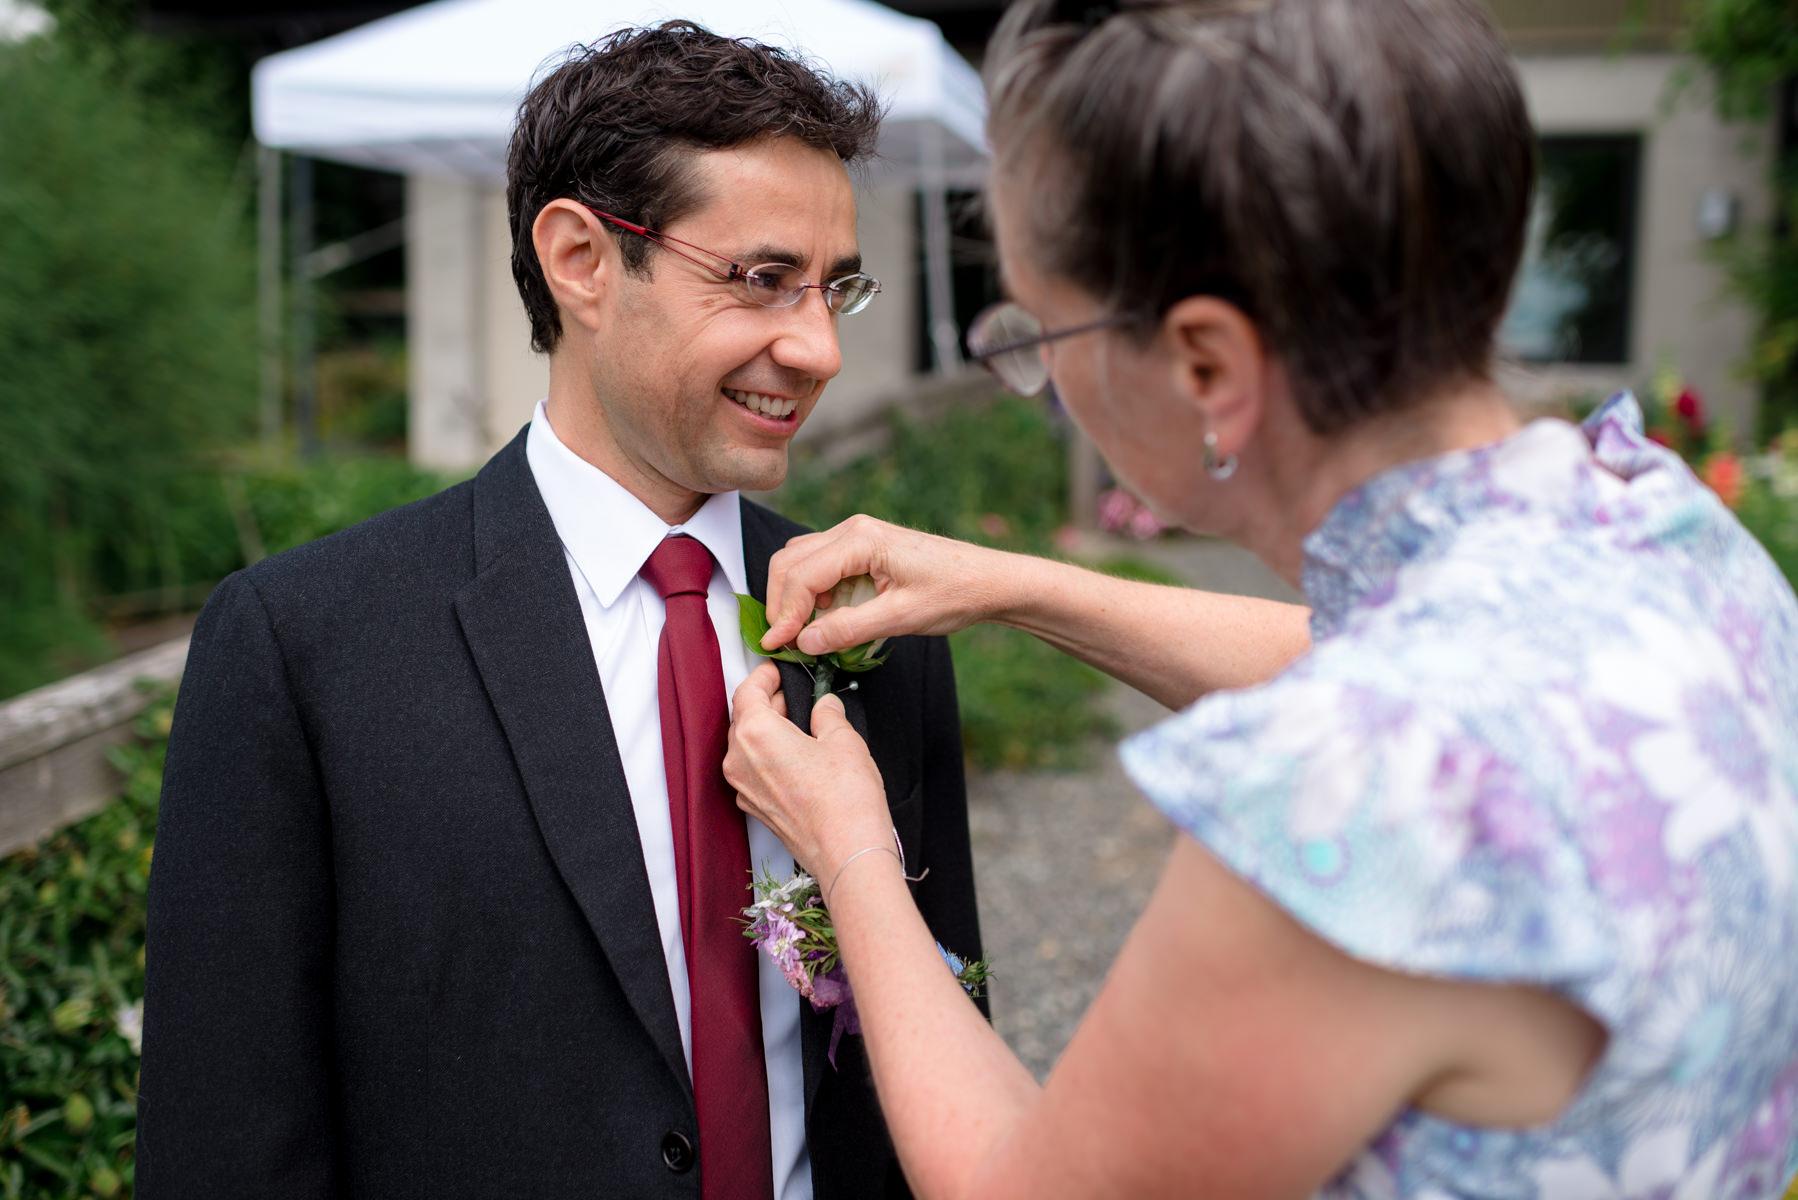 Andrew Tat - Documentary Wedding Photography - Kirkland, Washington - Emily & Cuauh - 03.JPG